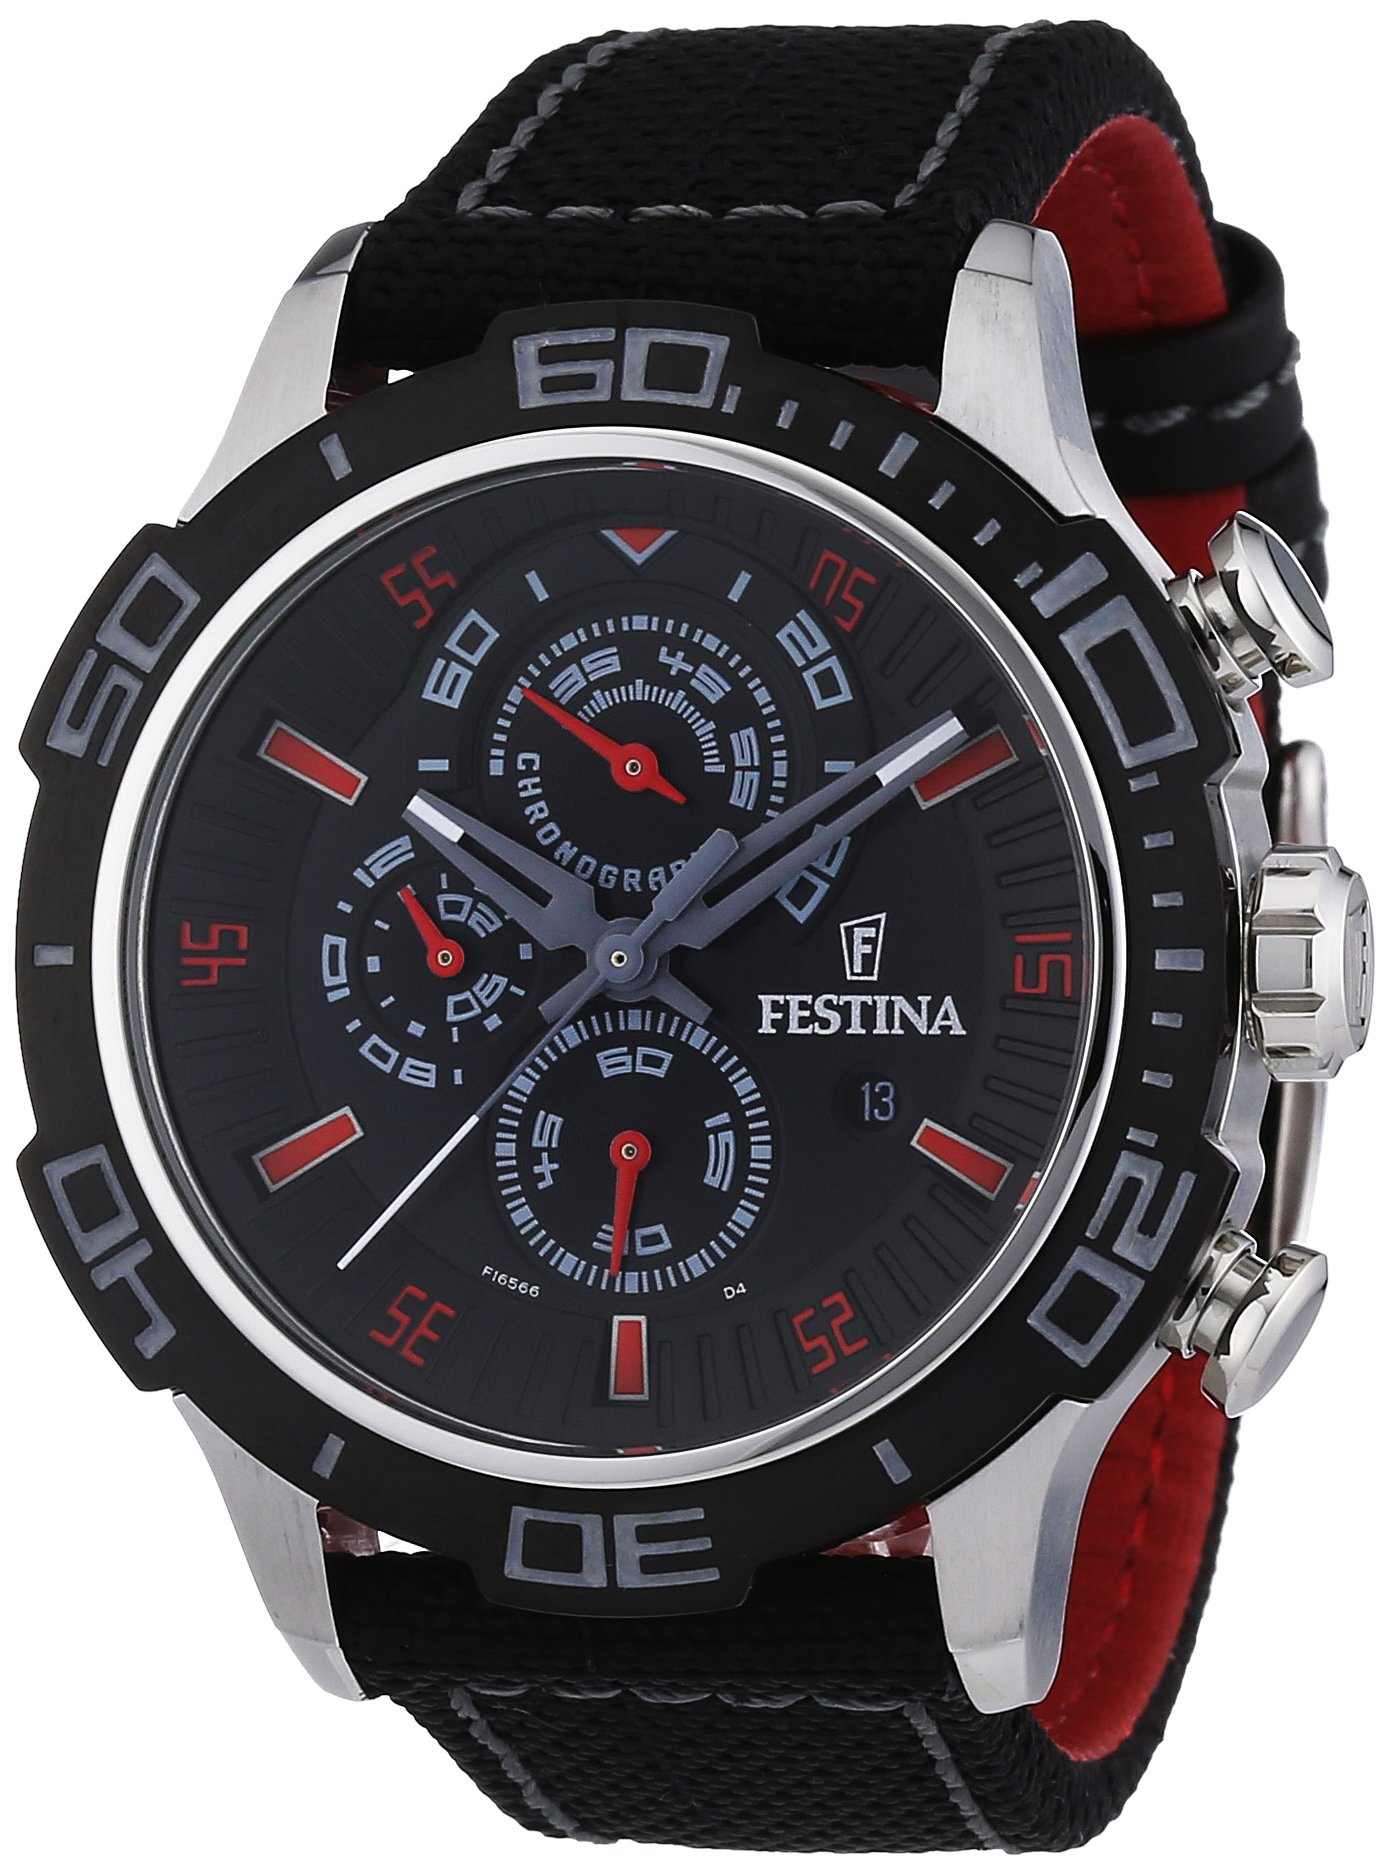 Festina La Vuelta F16566/7 – Reloj cronógrafo de cuarzo para hombre, correa de nailon color negro (cronómetro)